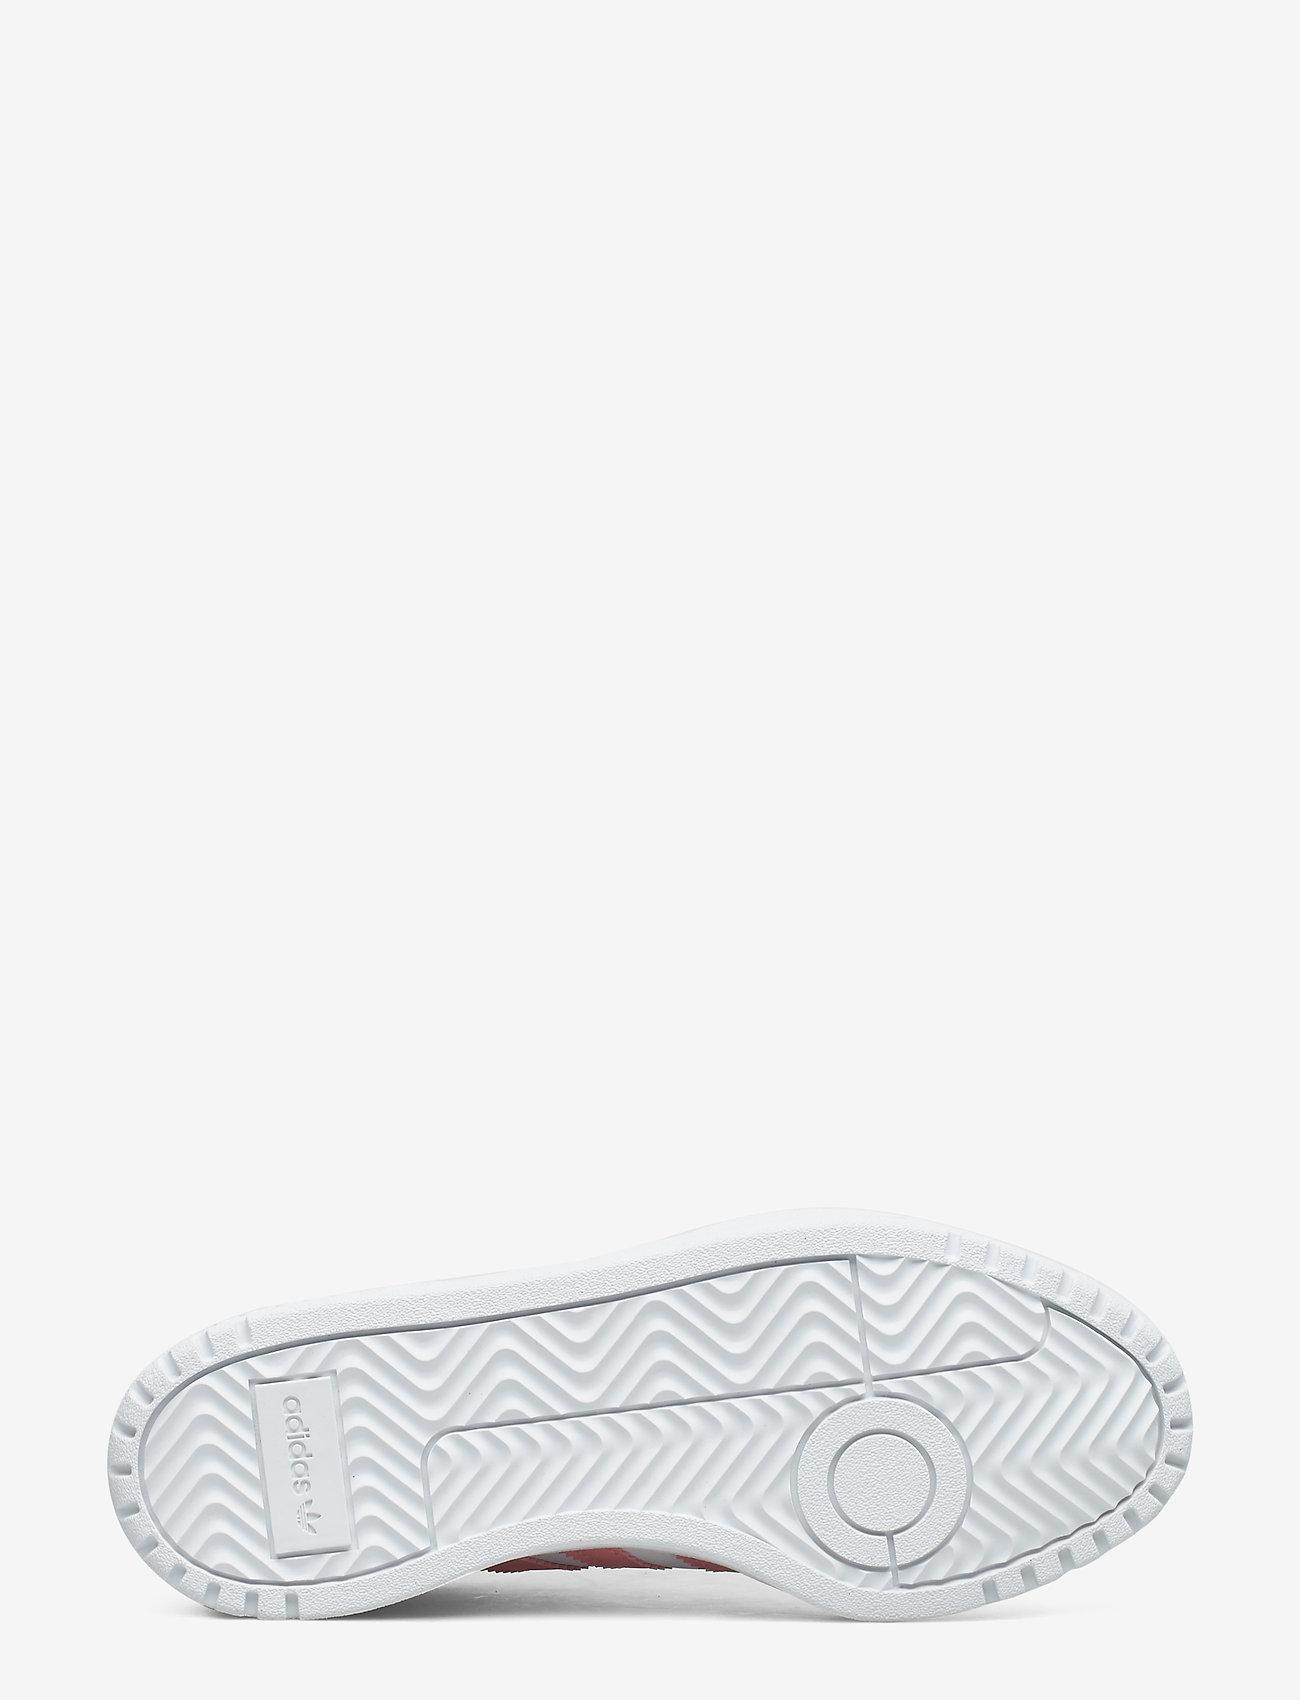 Adidas Originals Team Court J - Sneakers Ftwwht/glopnk/cblack